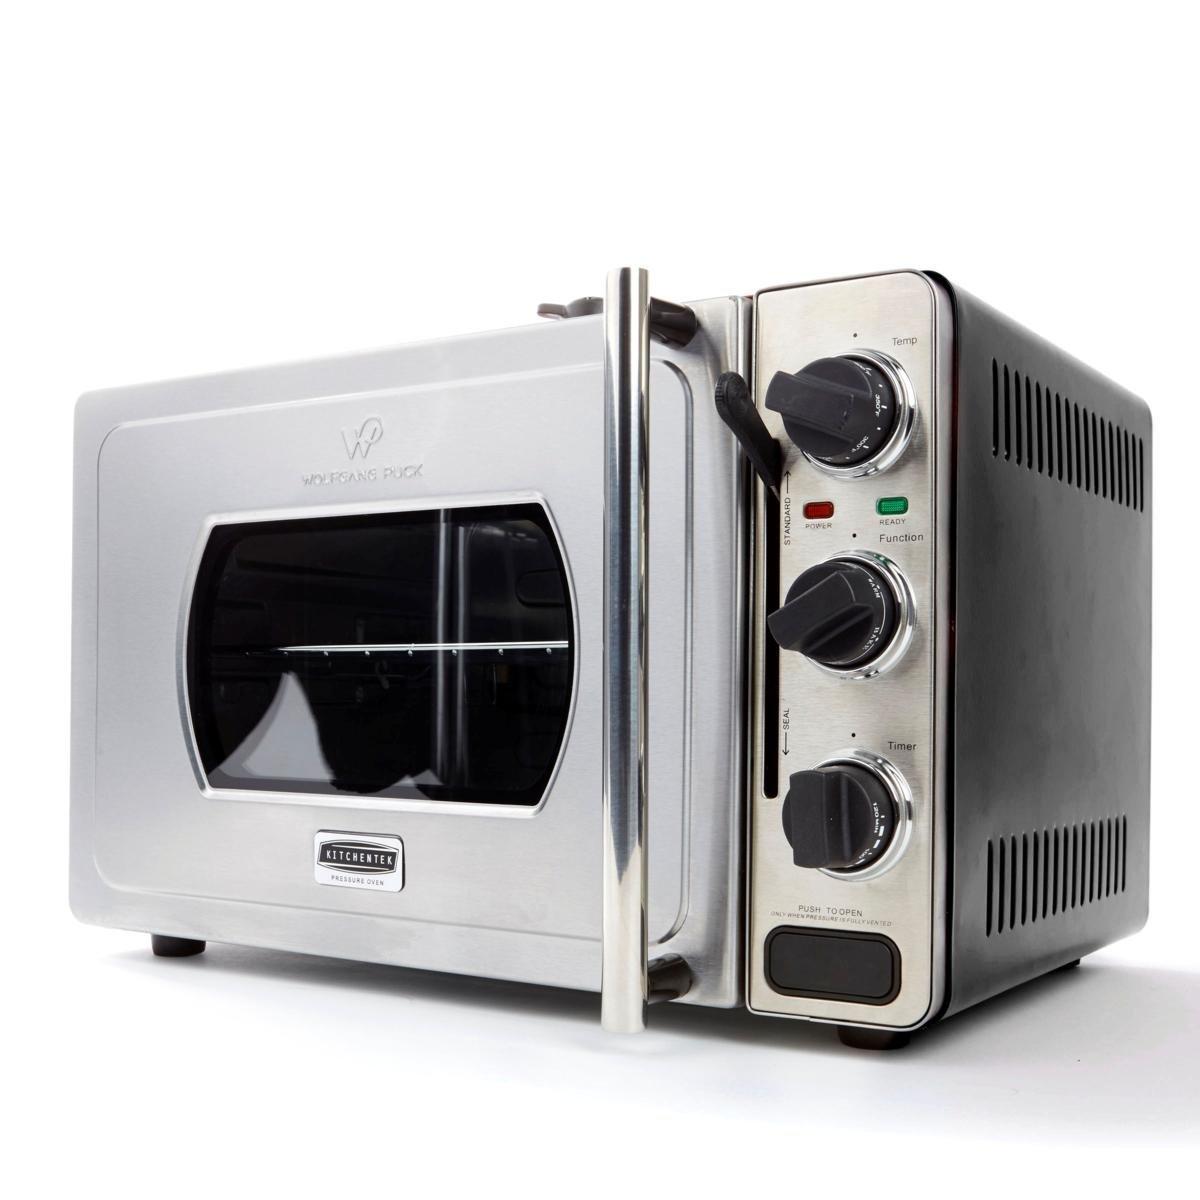 Wolfgang Puck Large 29-Liter Rotisserie Pressure Oven 558-674, Black